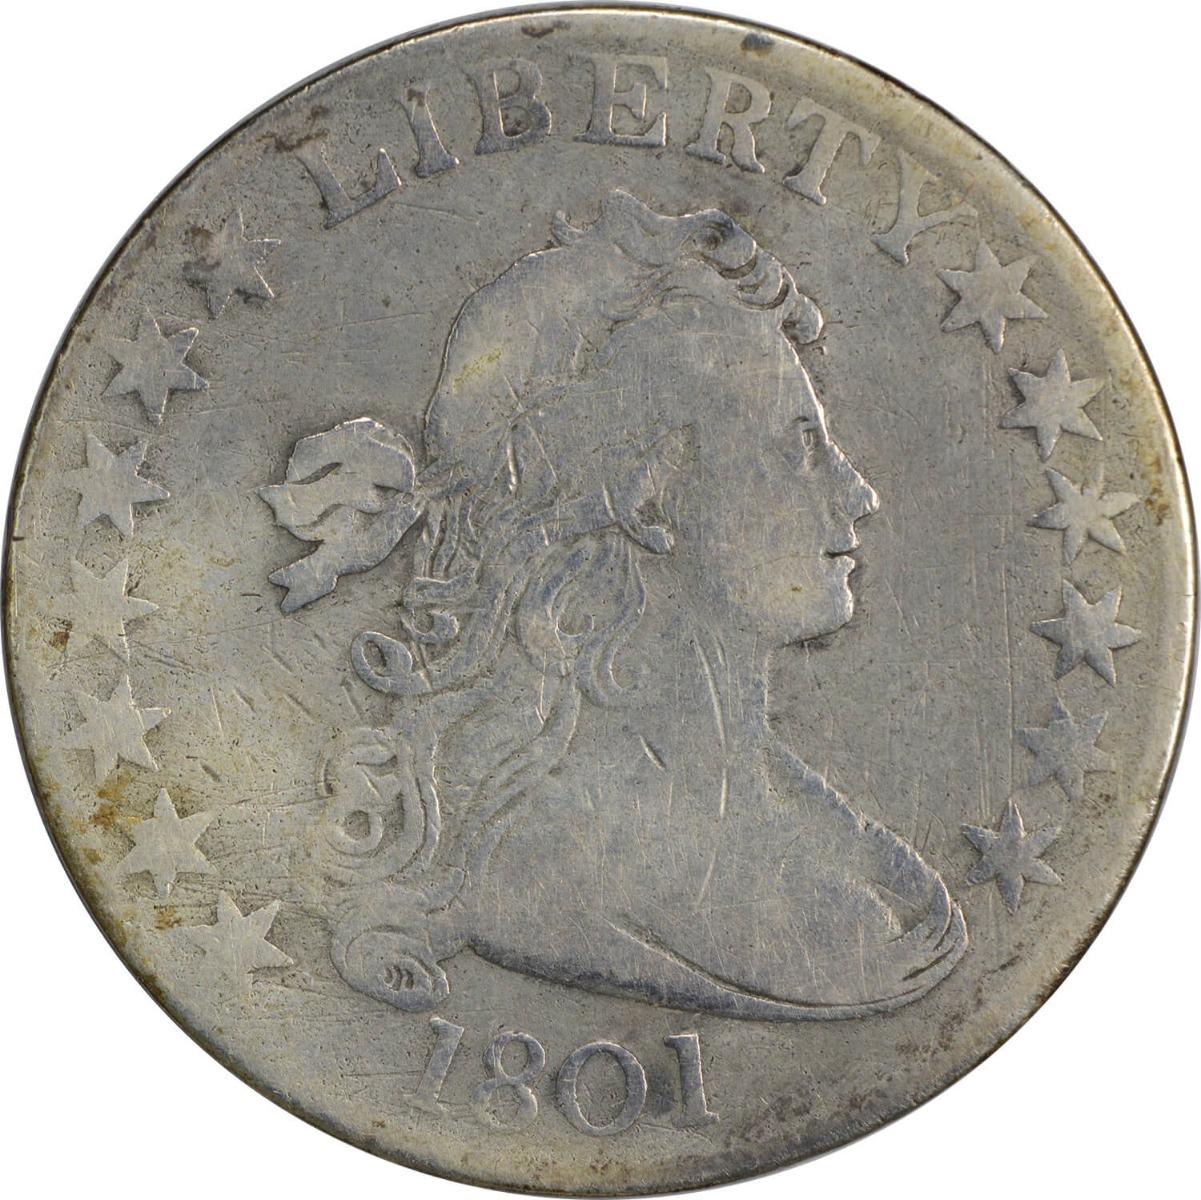 1801 Bust Half Dollar, VF, Uncertified